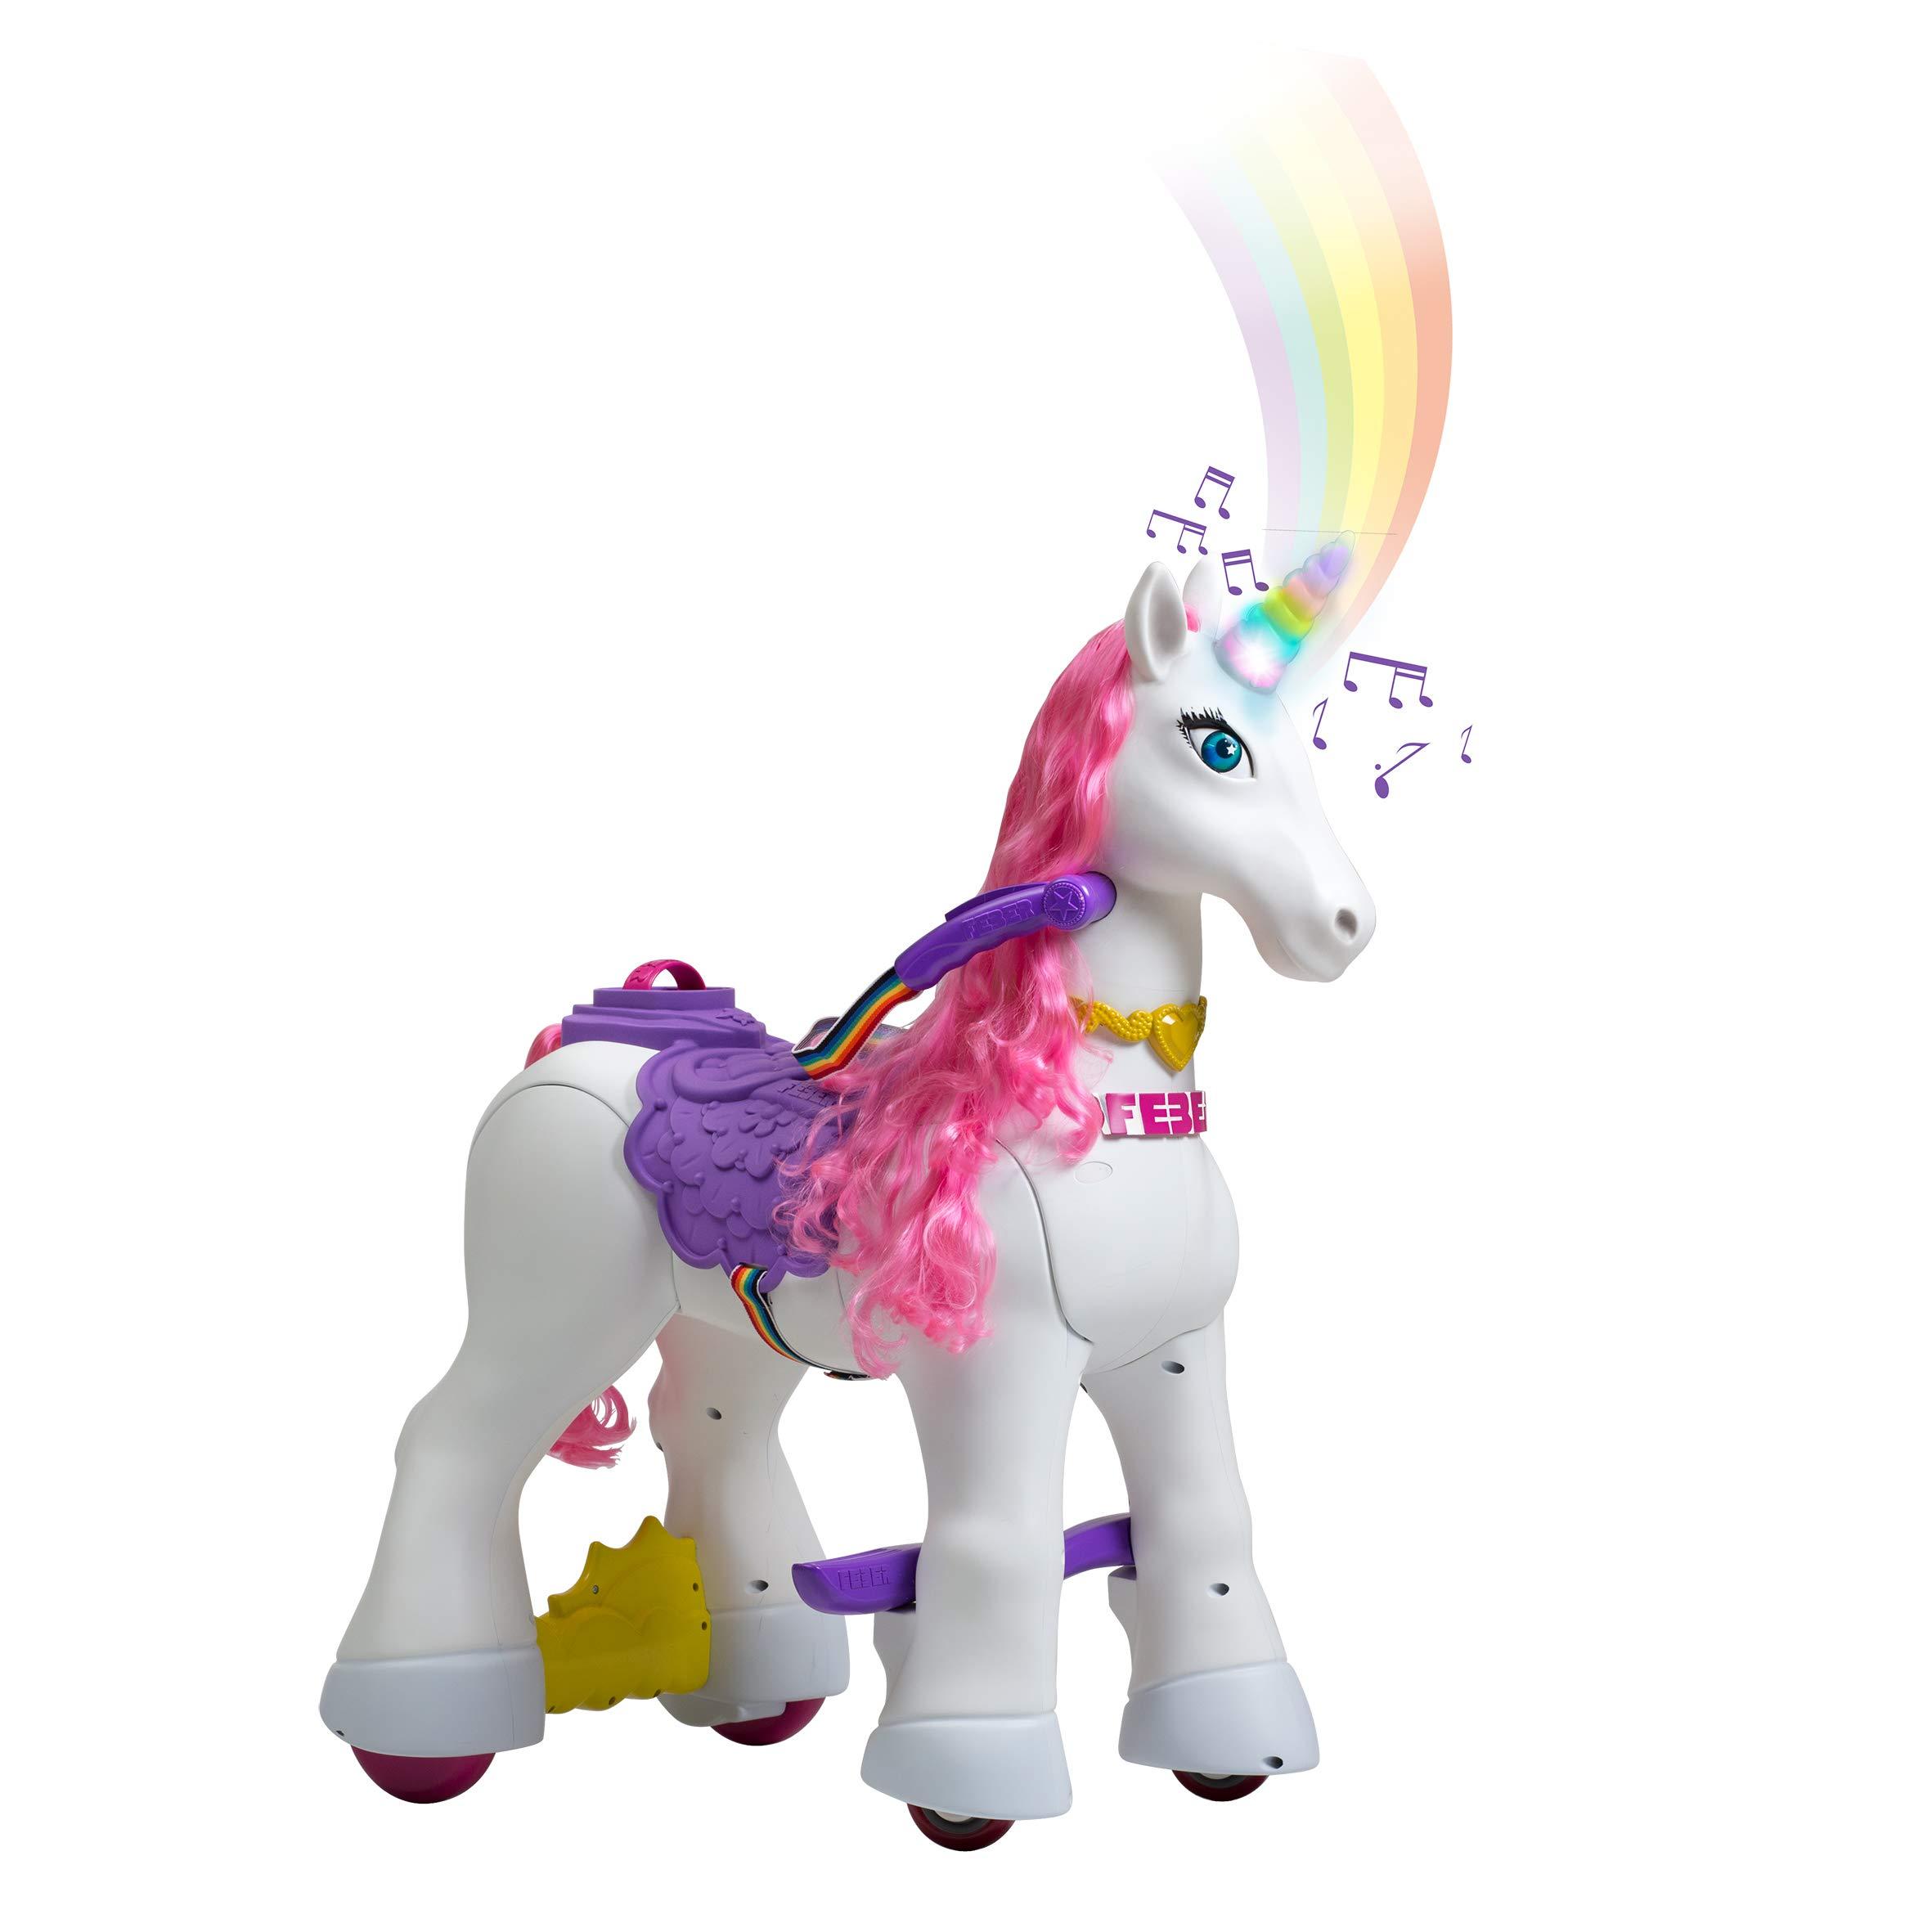 FEBER - My Lovely Unicorn con Melena Rosa, Mascota electrónica y ...